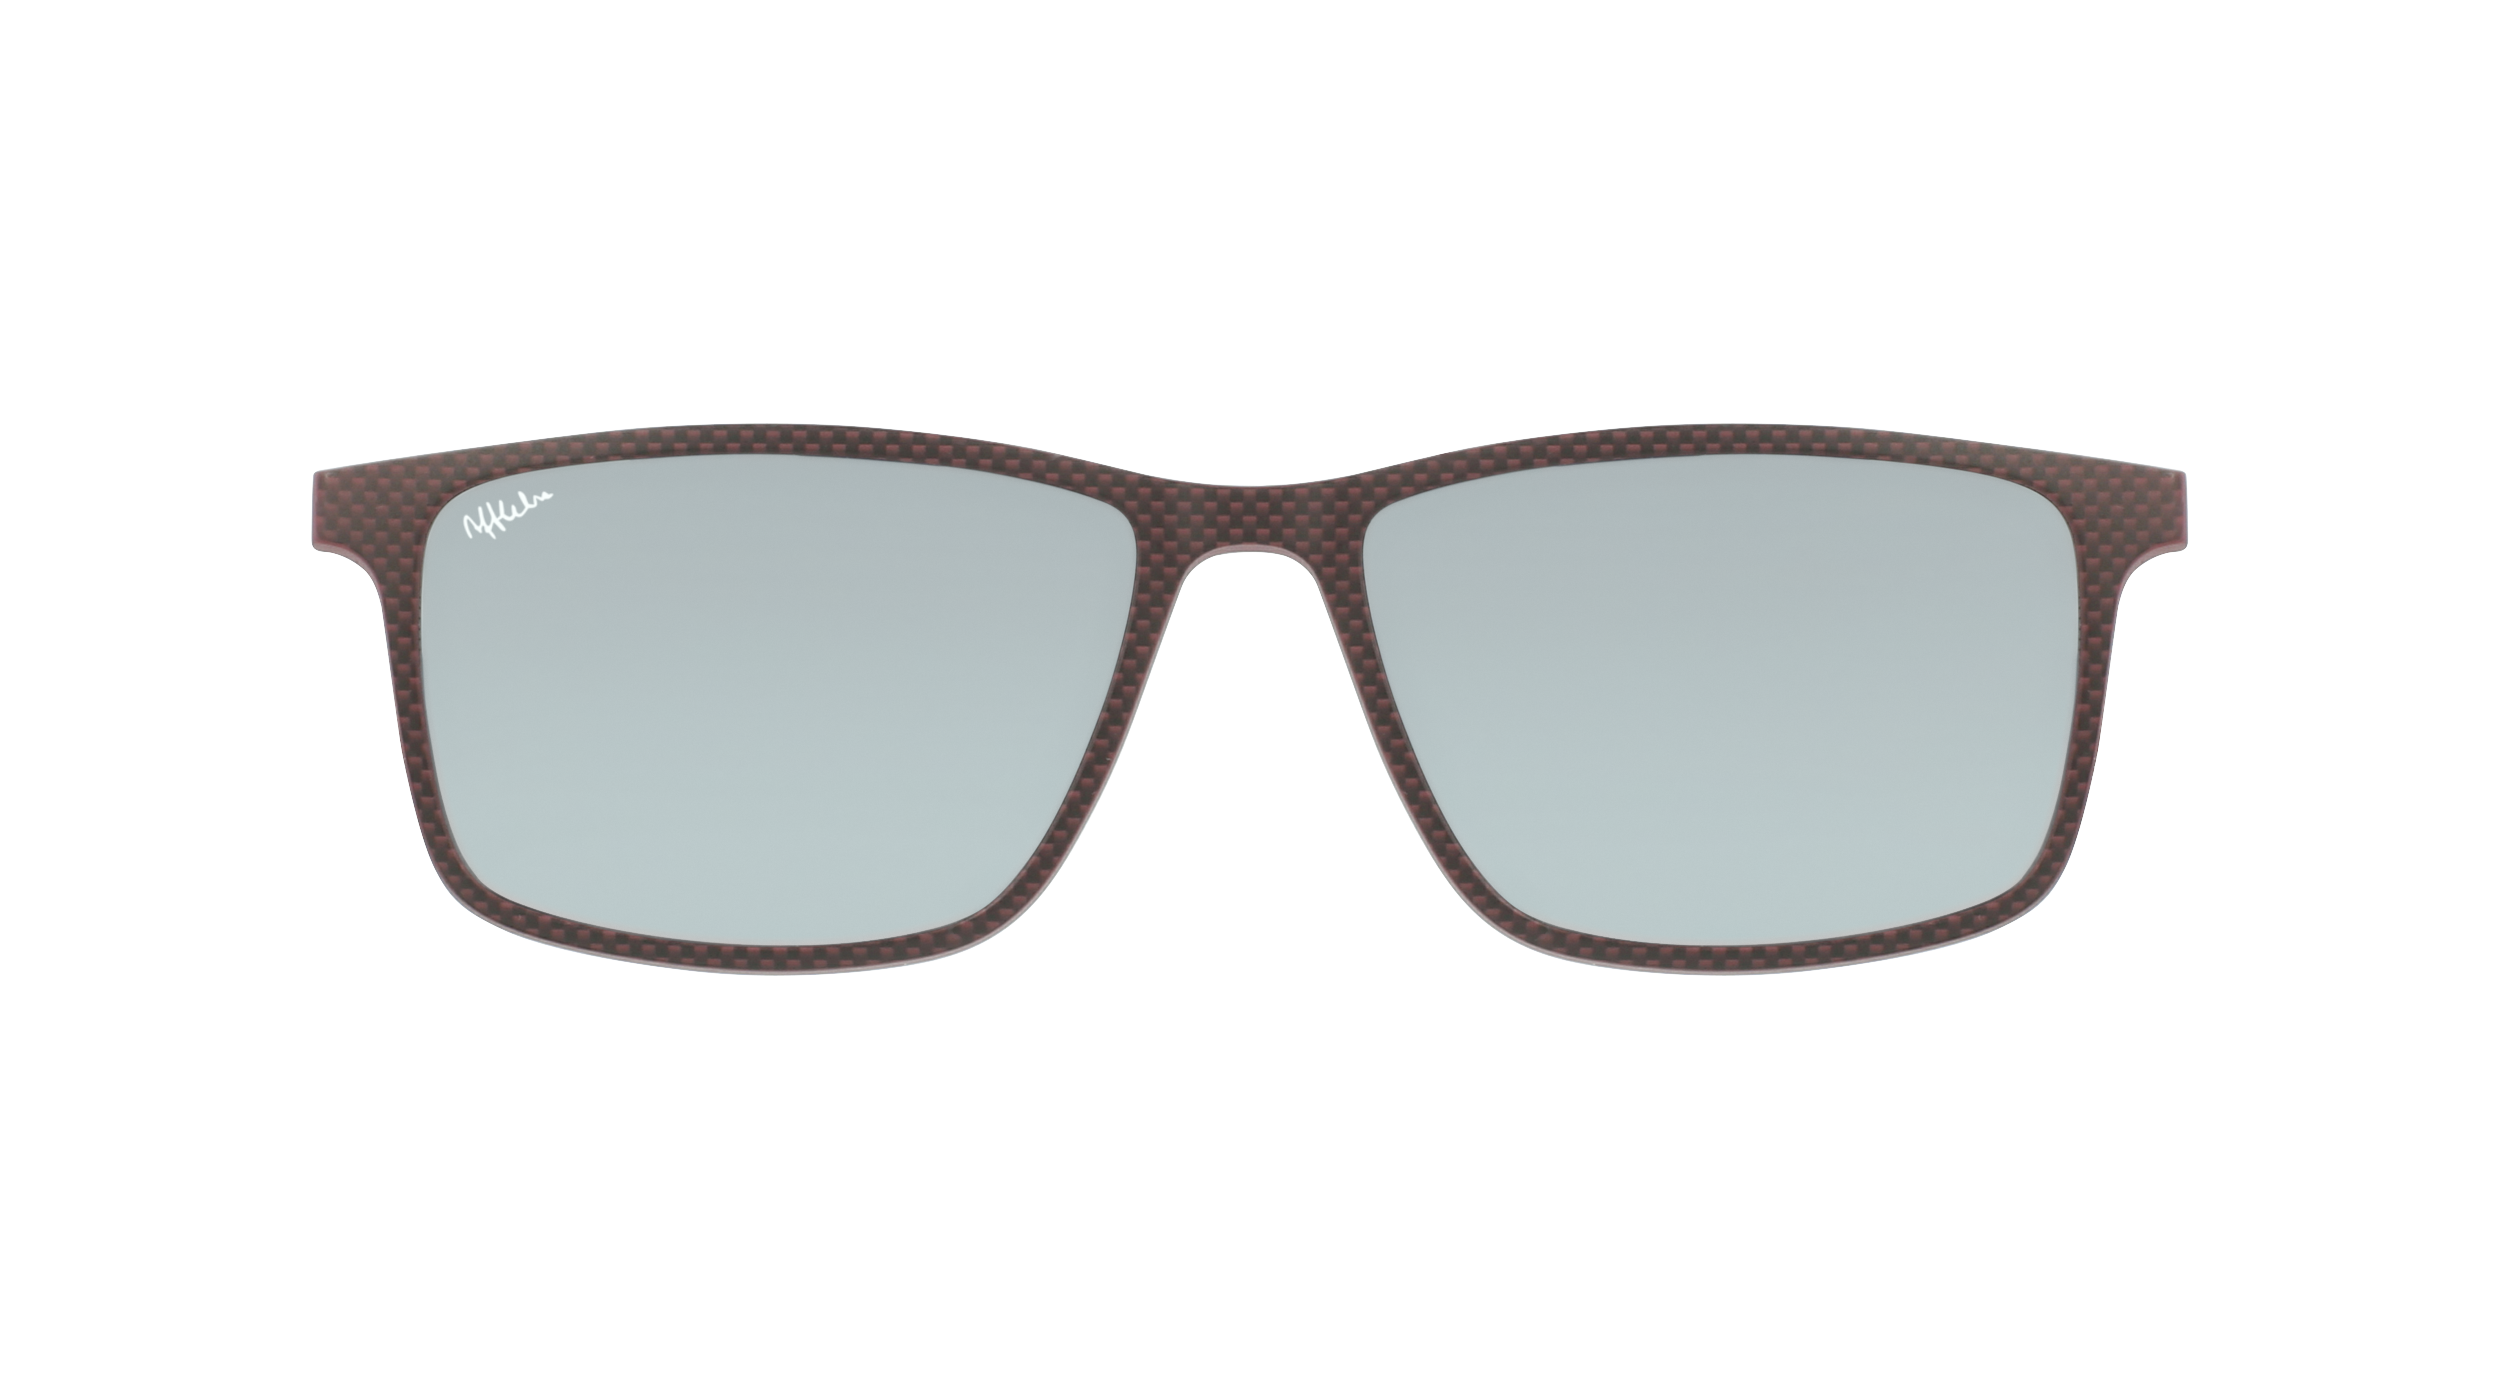 afflelou/france/products/smart_clip/clips_glasses/07630036457023.png